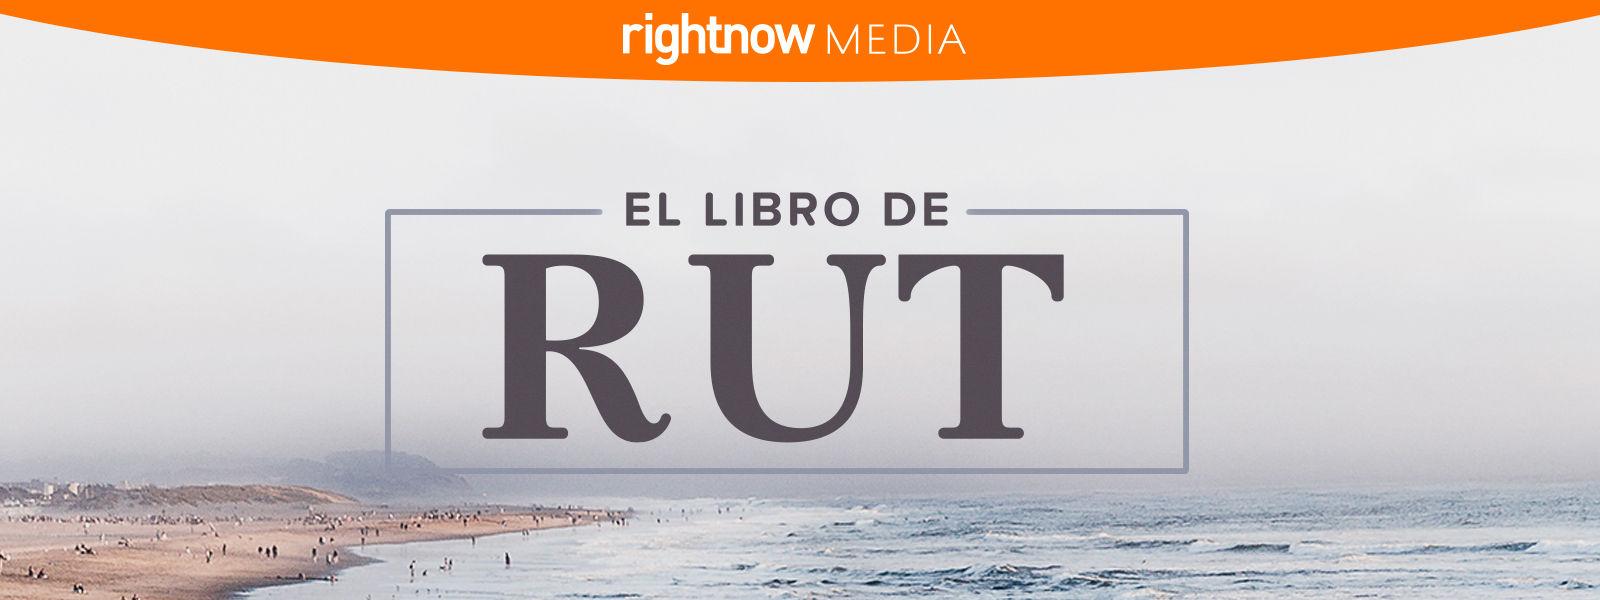 El Libro de Rut